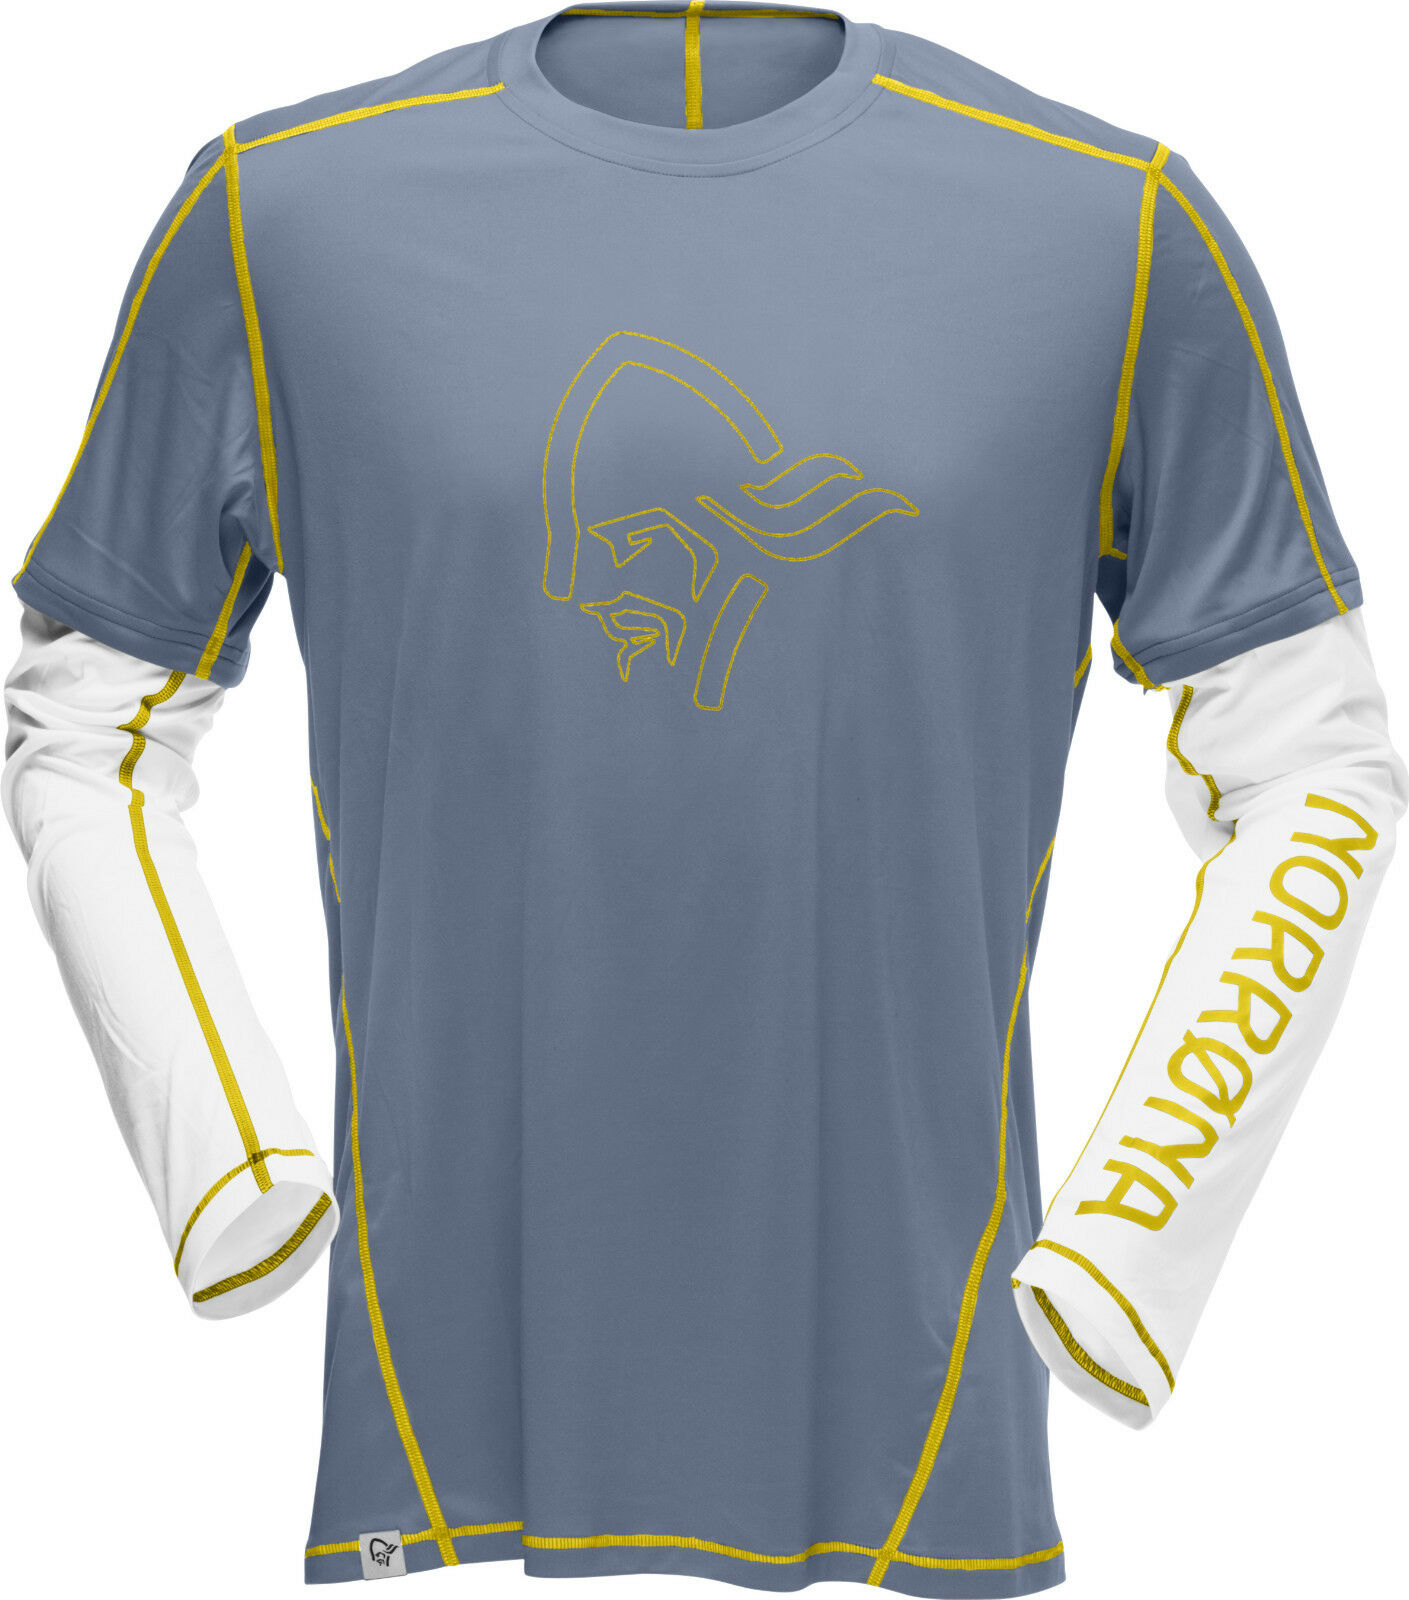 Norrona29 tech lungo sleeve Shirt M, asciuga rapidonnate, traspirante, all'aperto